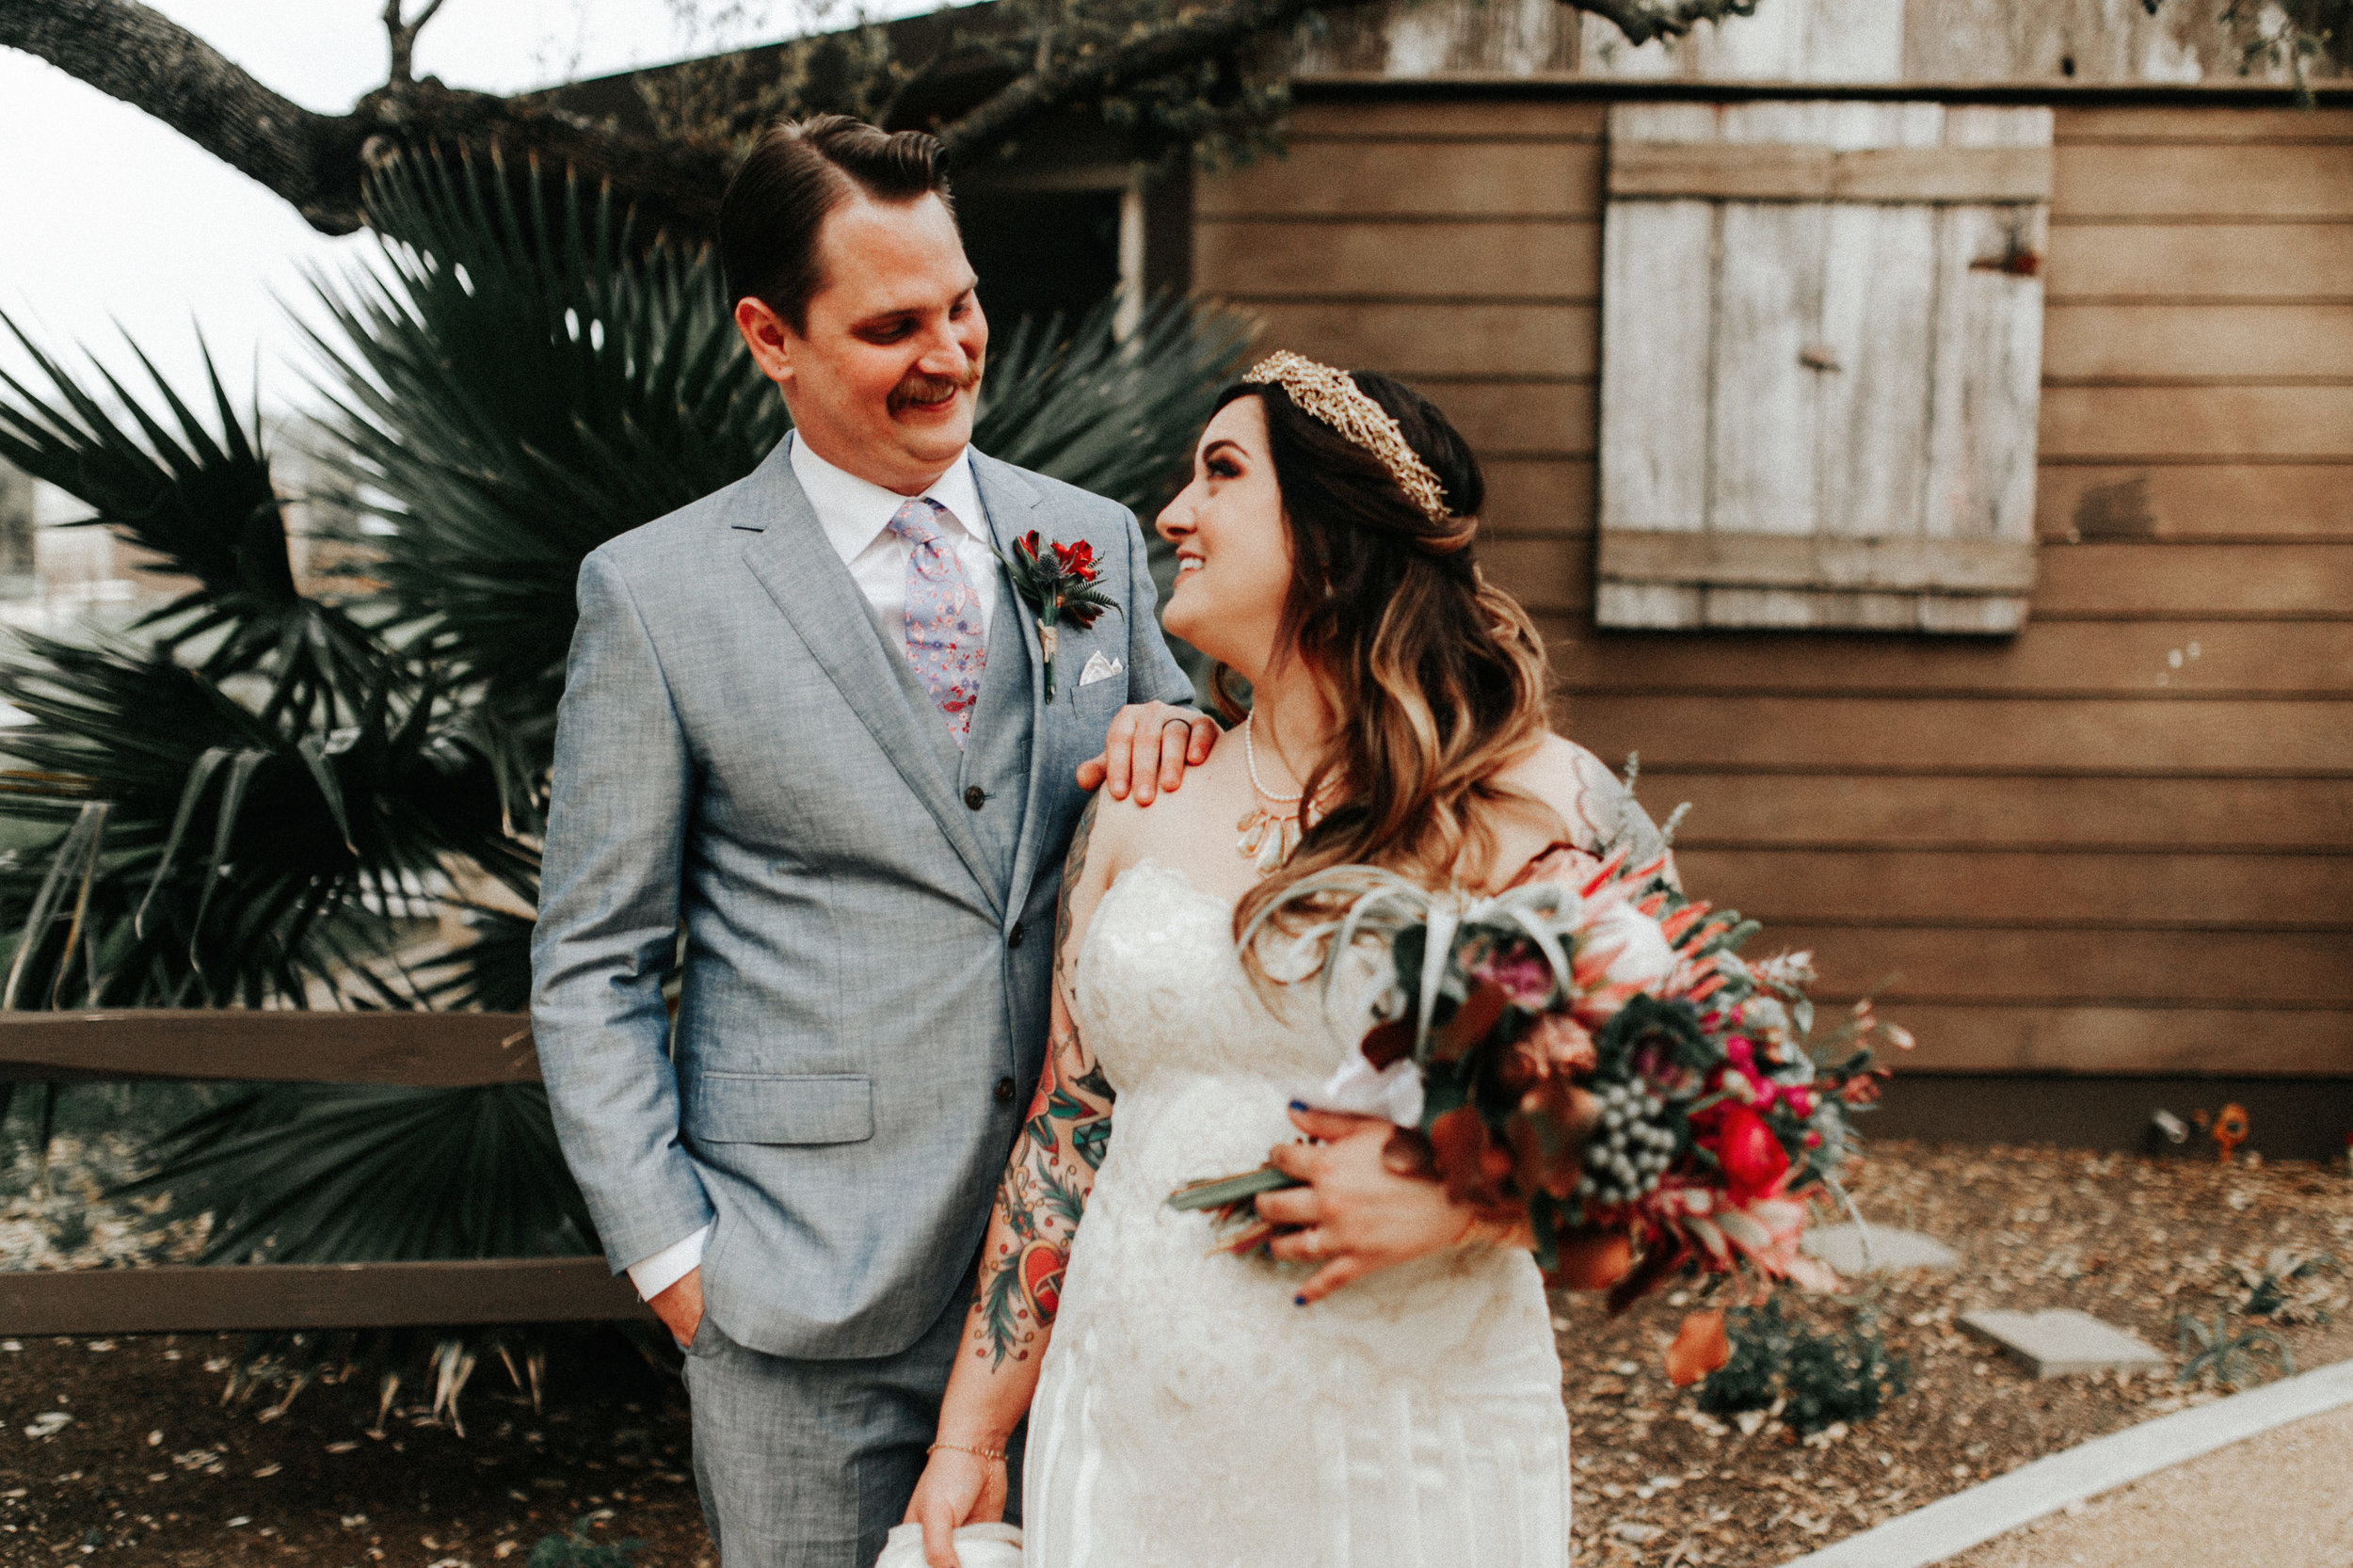 austin-wedding-photographer-39.jpg